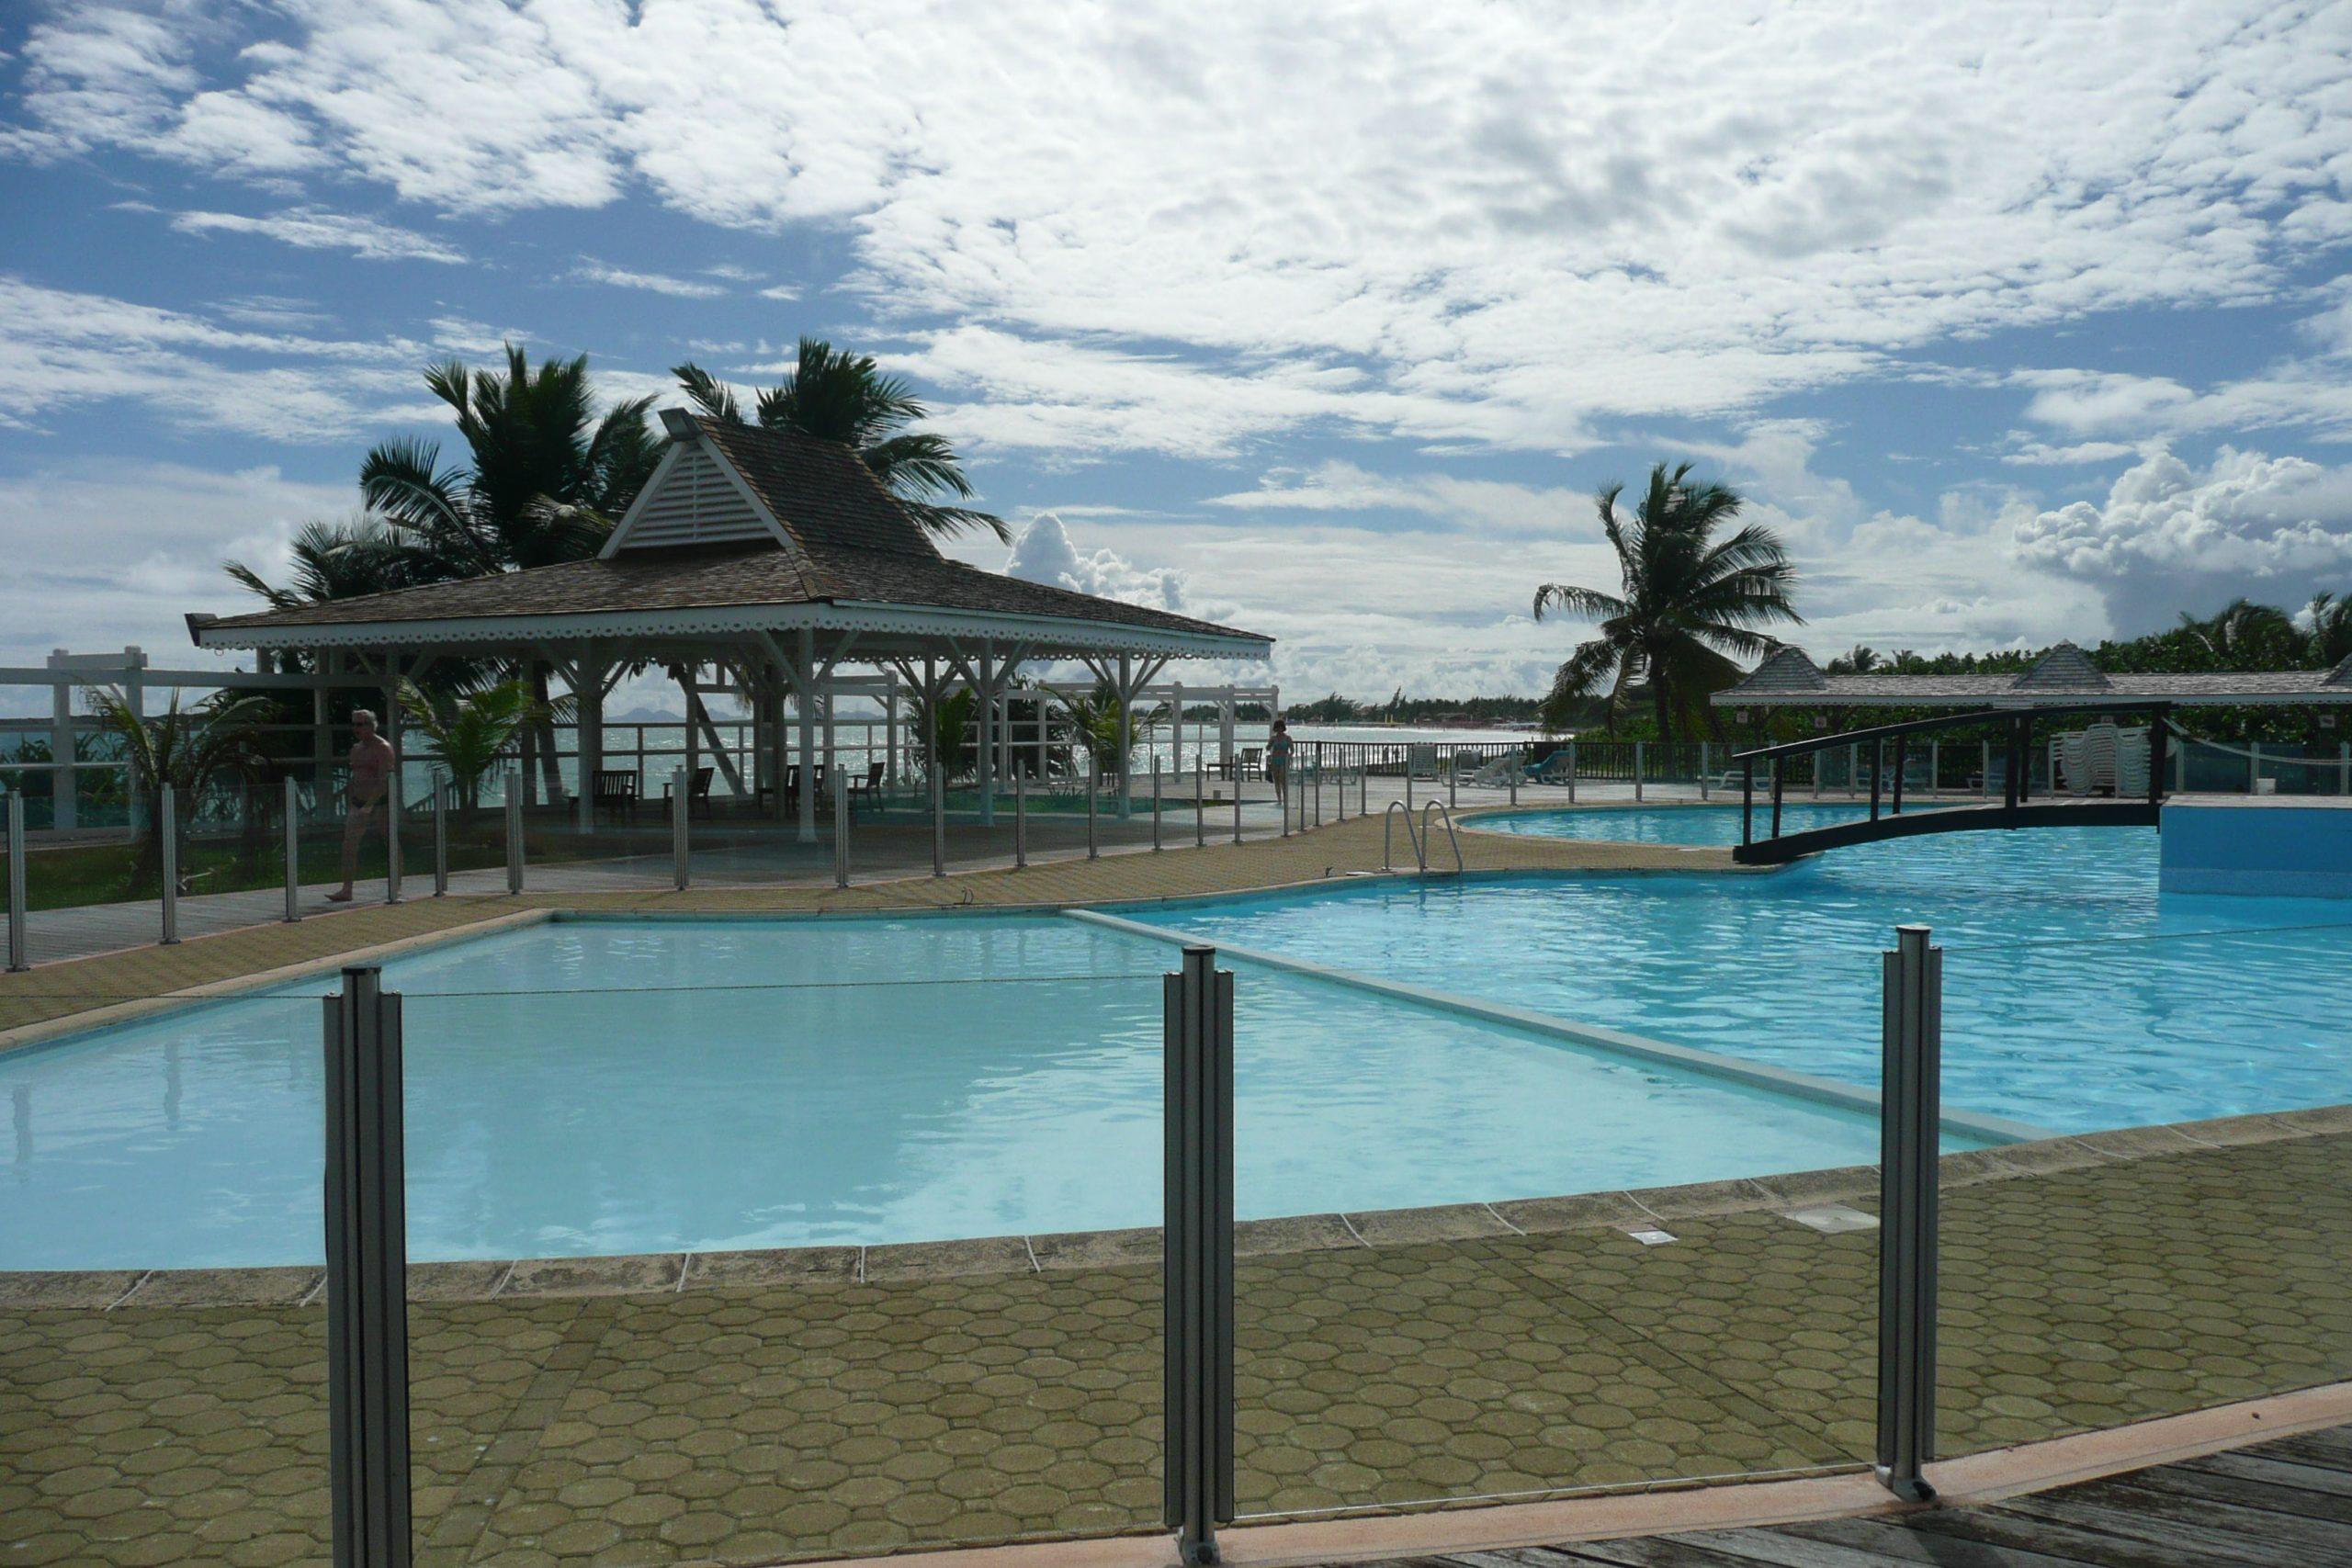 Rental Studio To Caribbean Sint Maarten French Side On The ... concernant Piscine Vernon